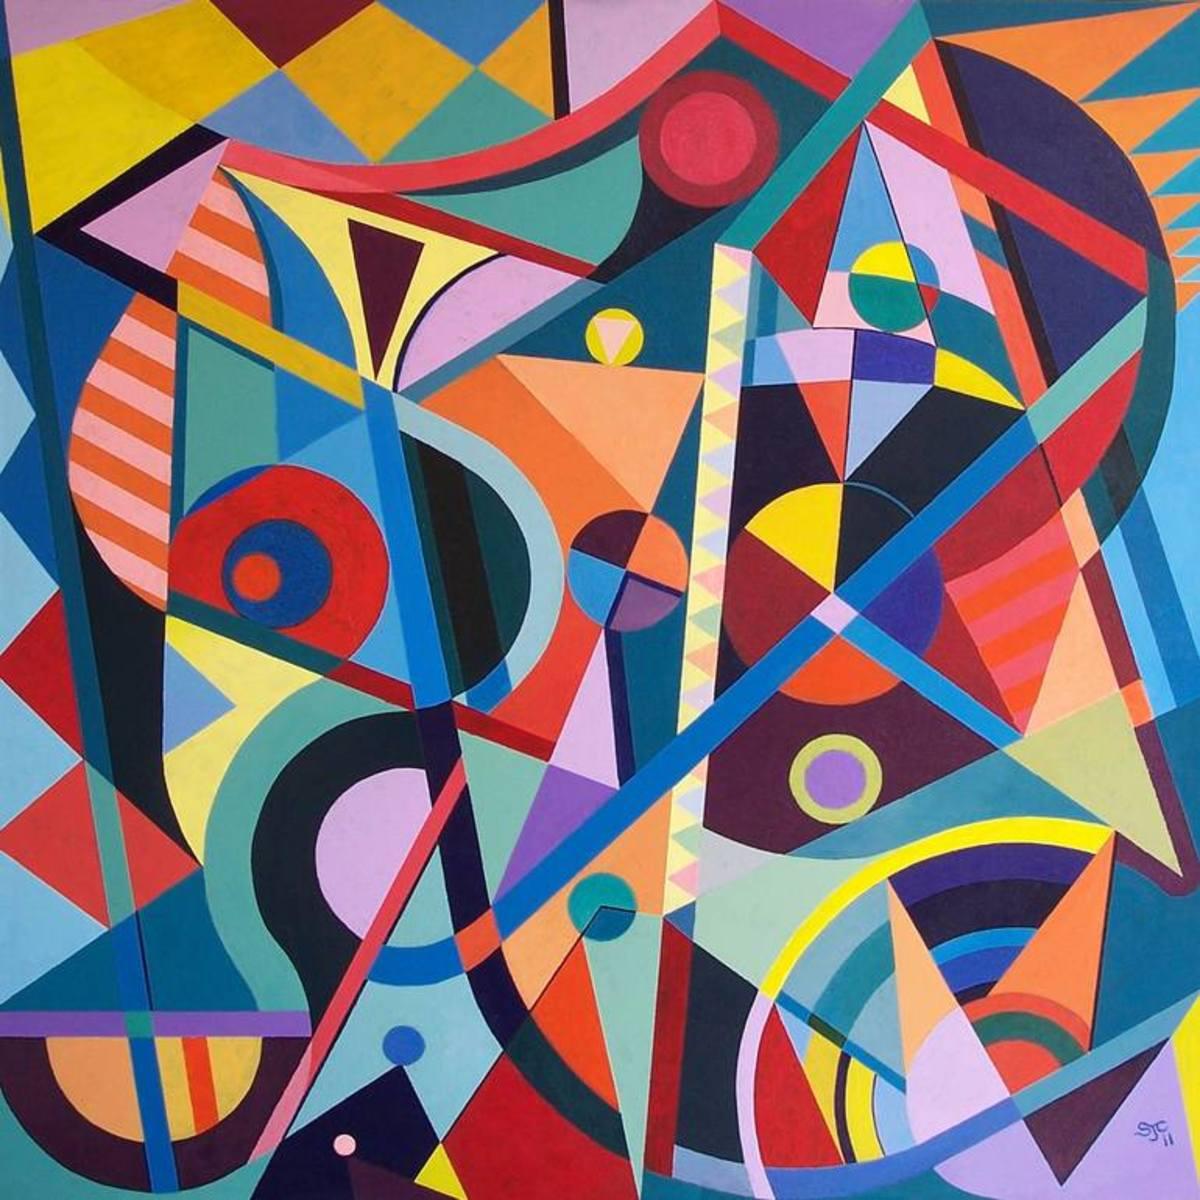 Geometric Painting | Saatchi Art